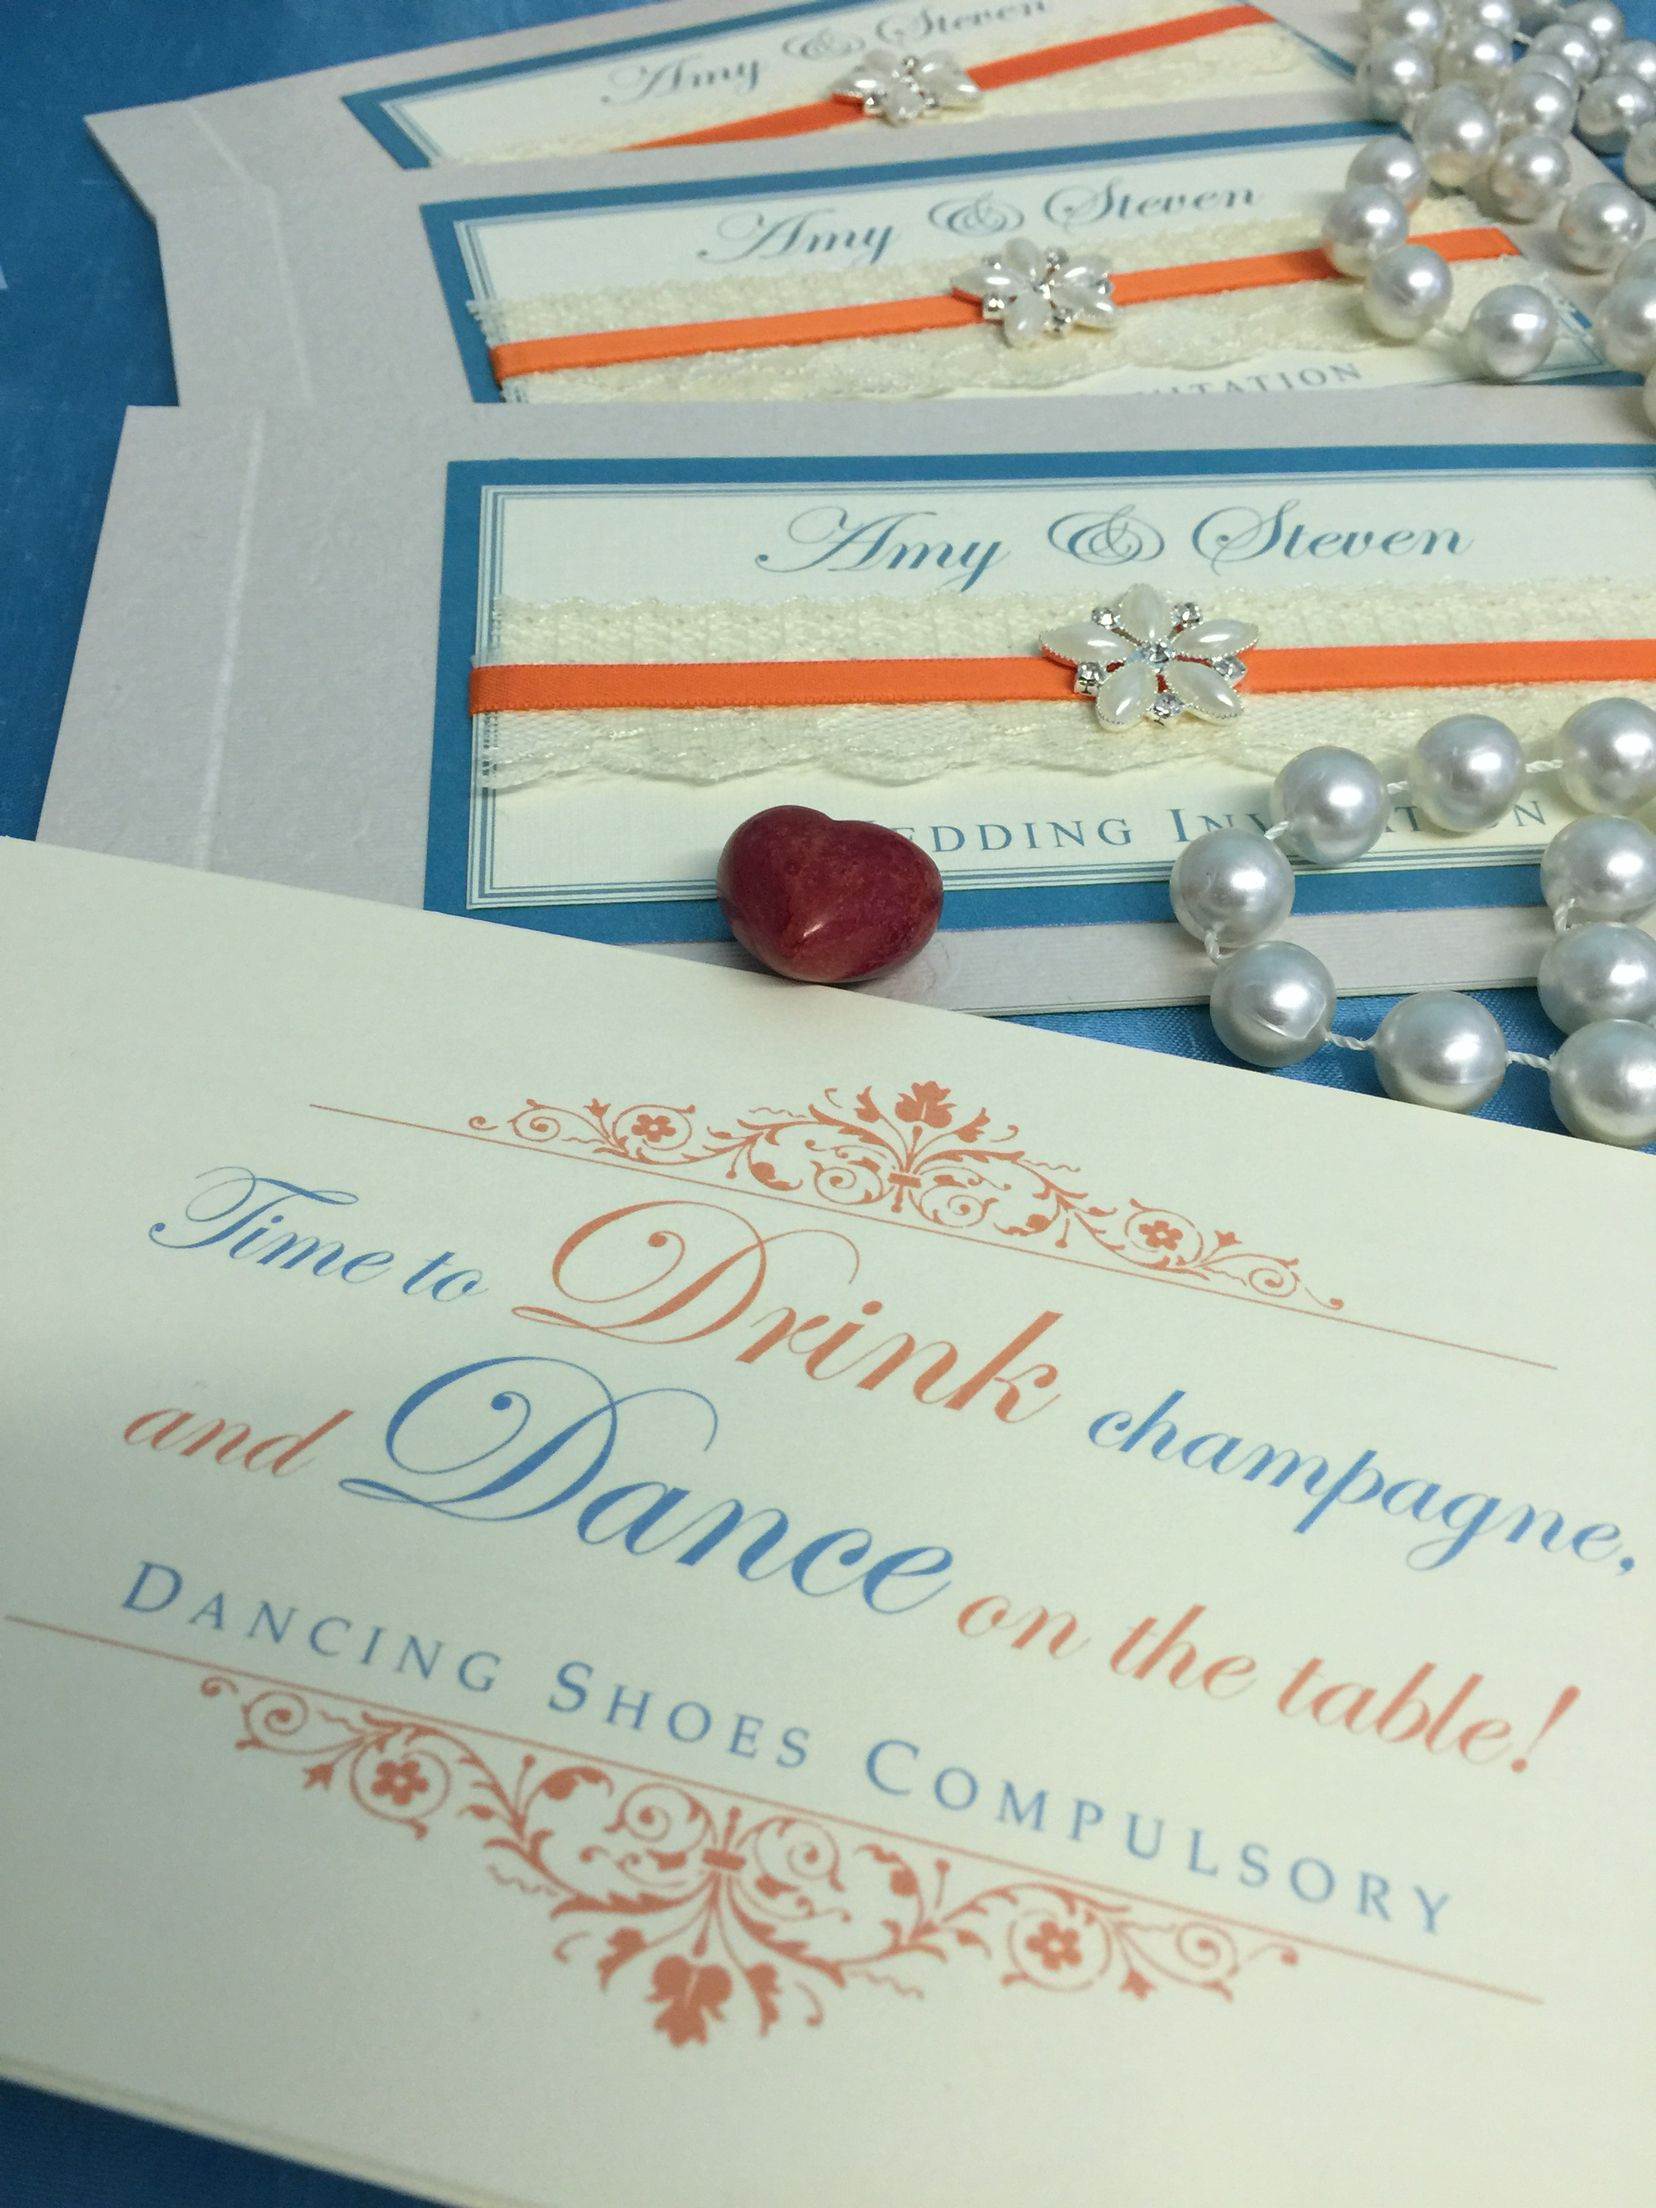 Striking vintage chequebook wedding invitation. Dare to be different ...